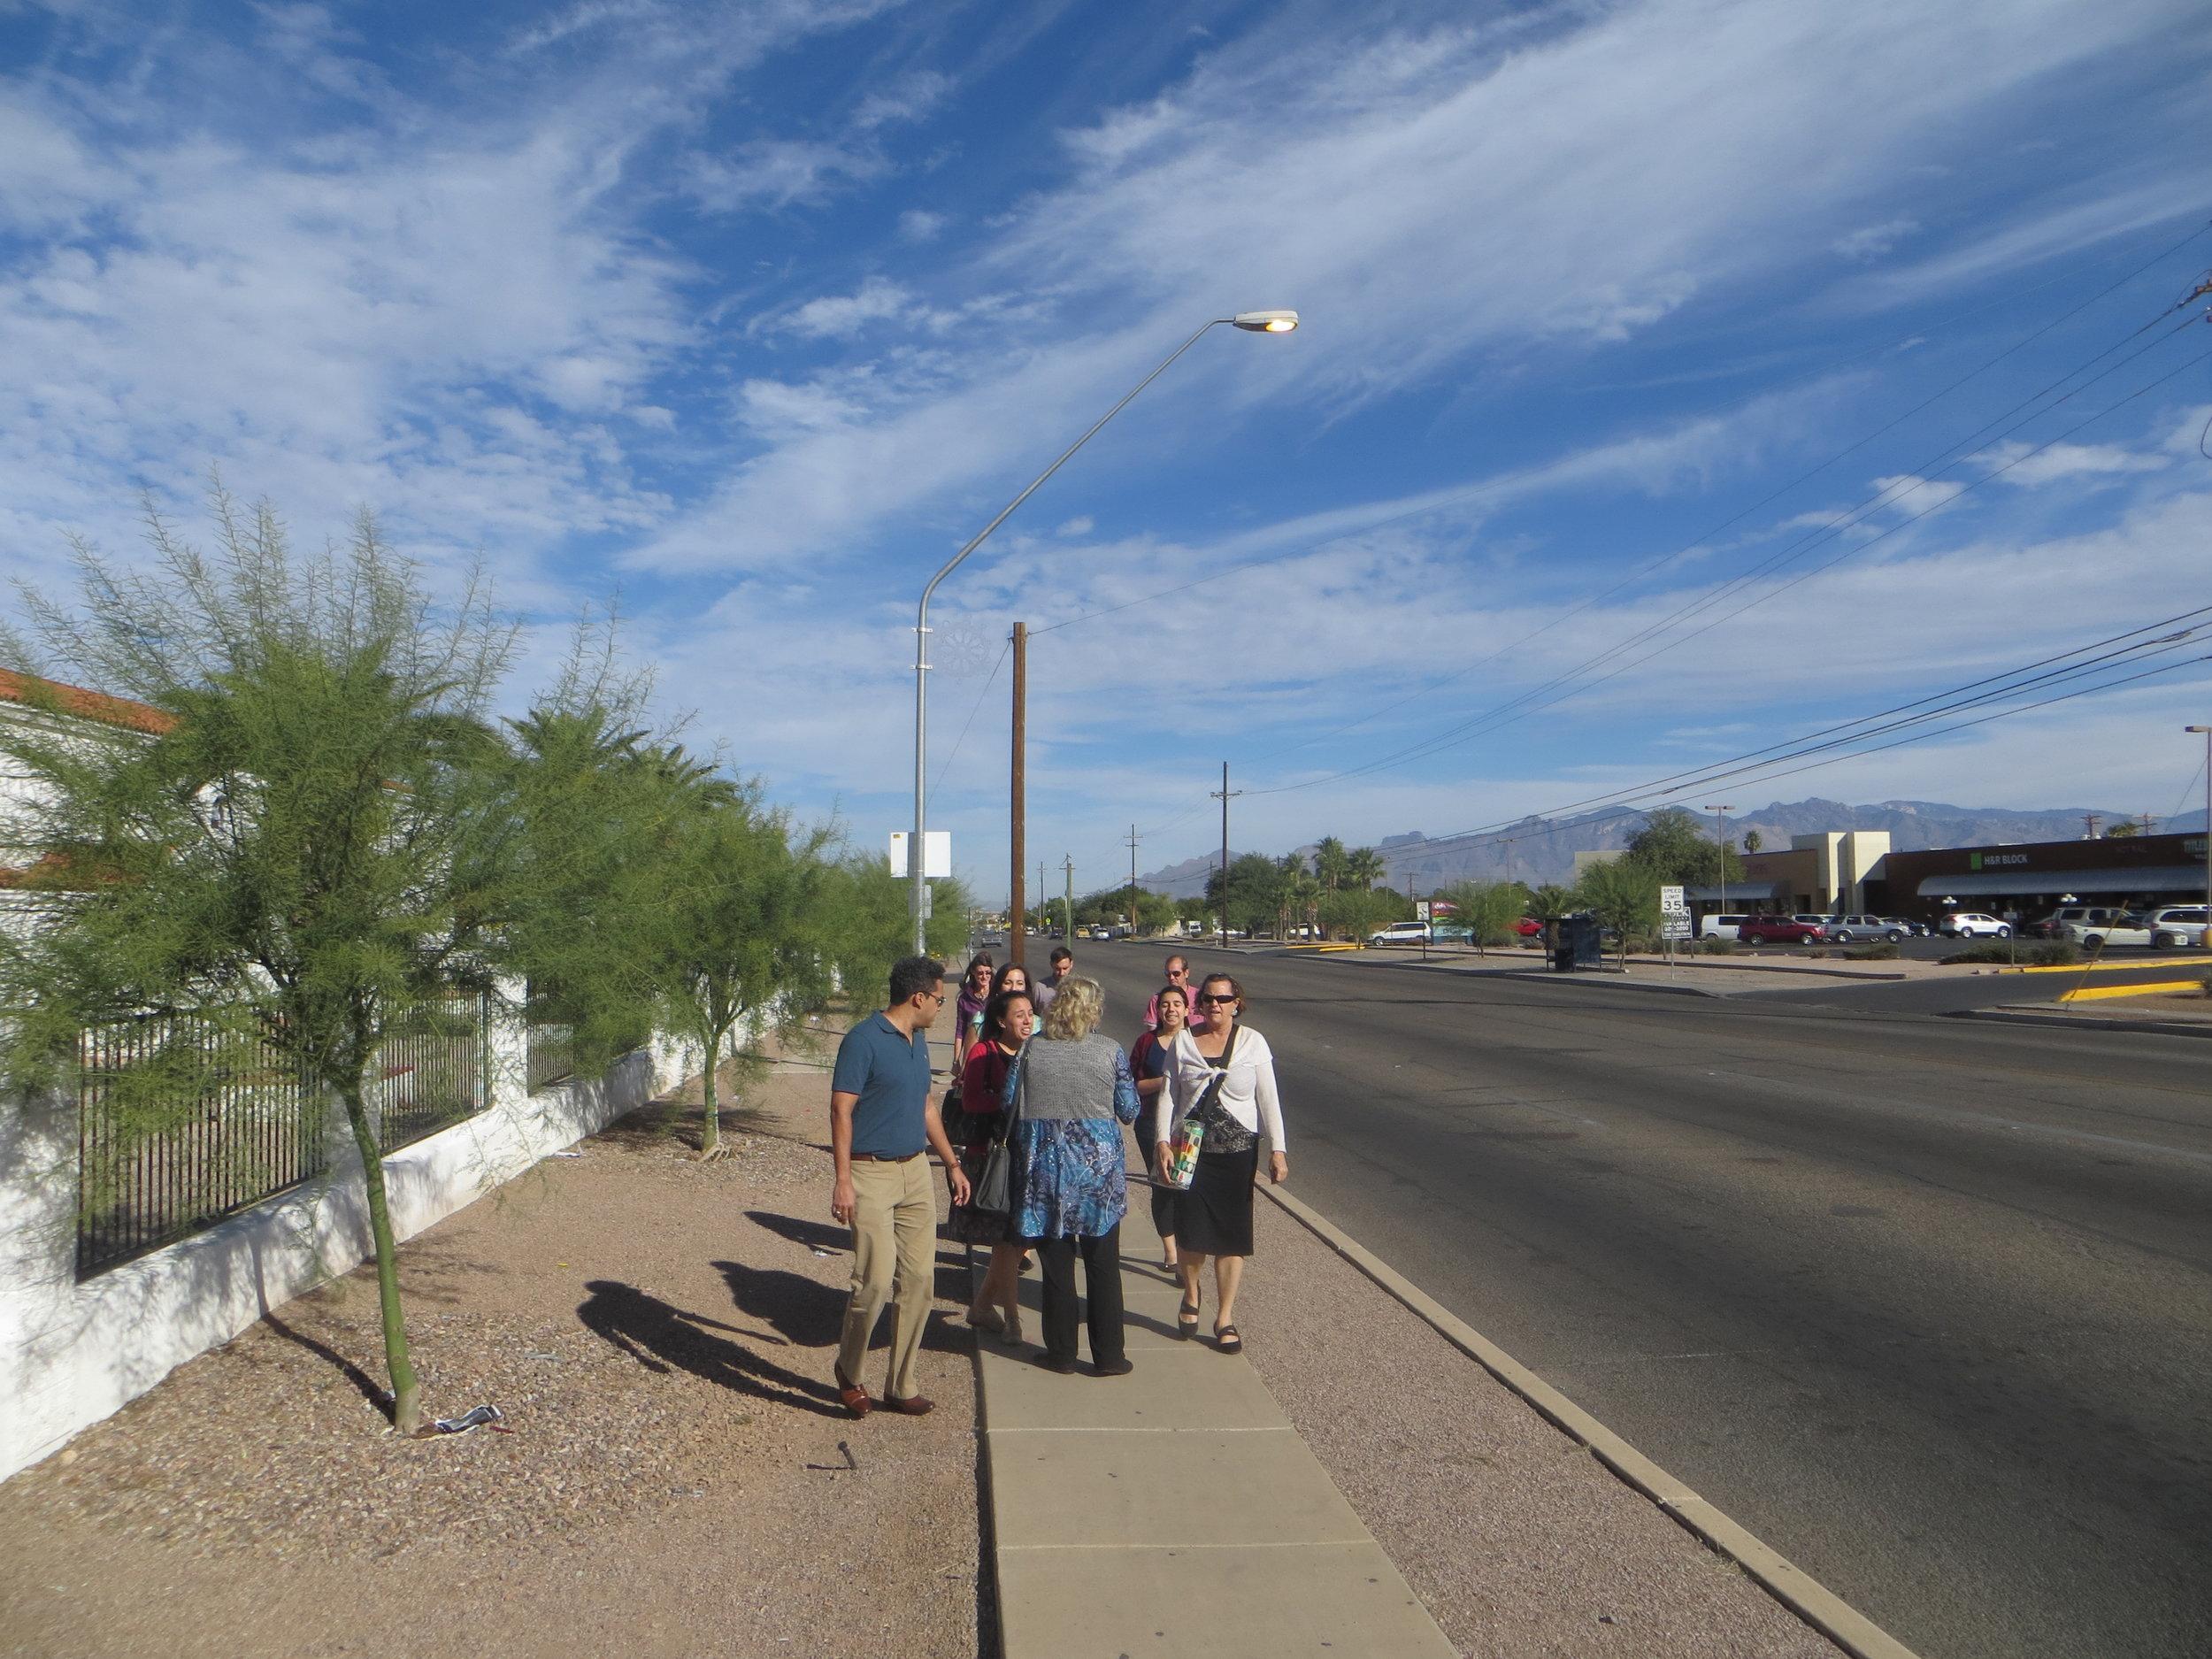 Source: City of Tucson